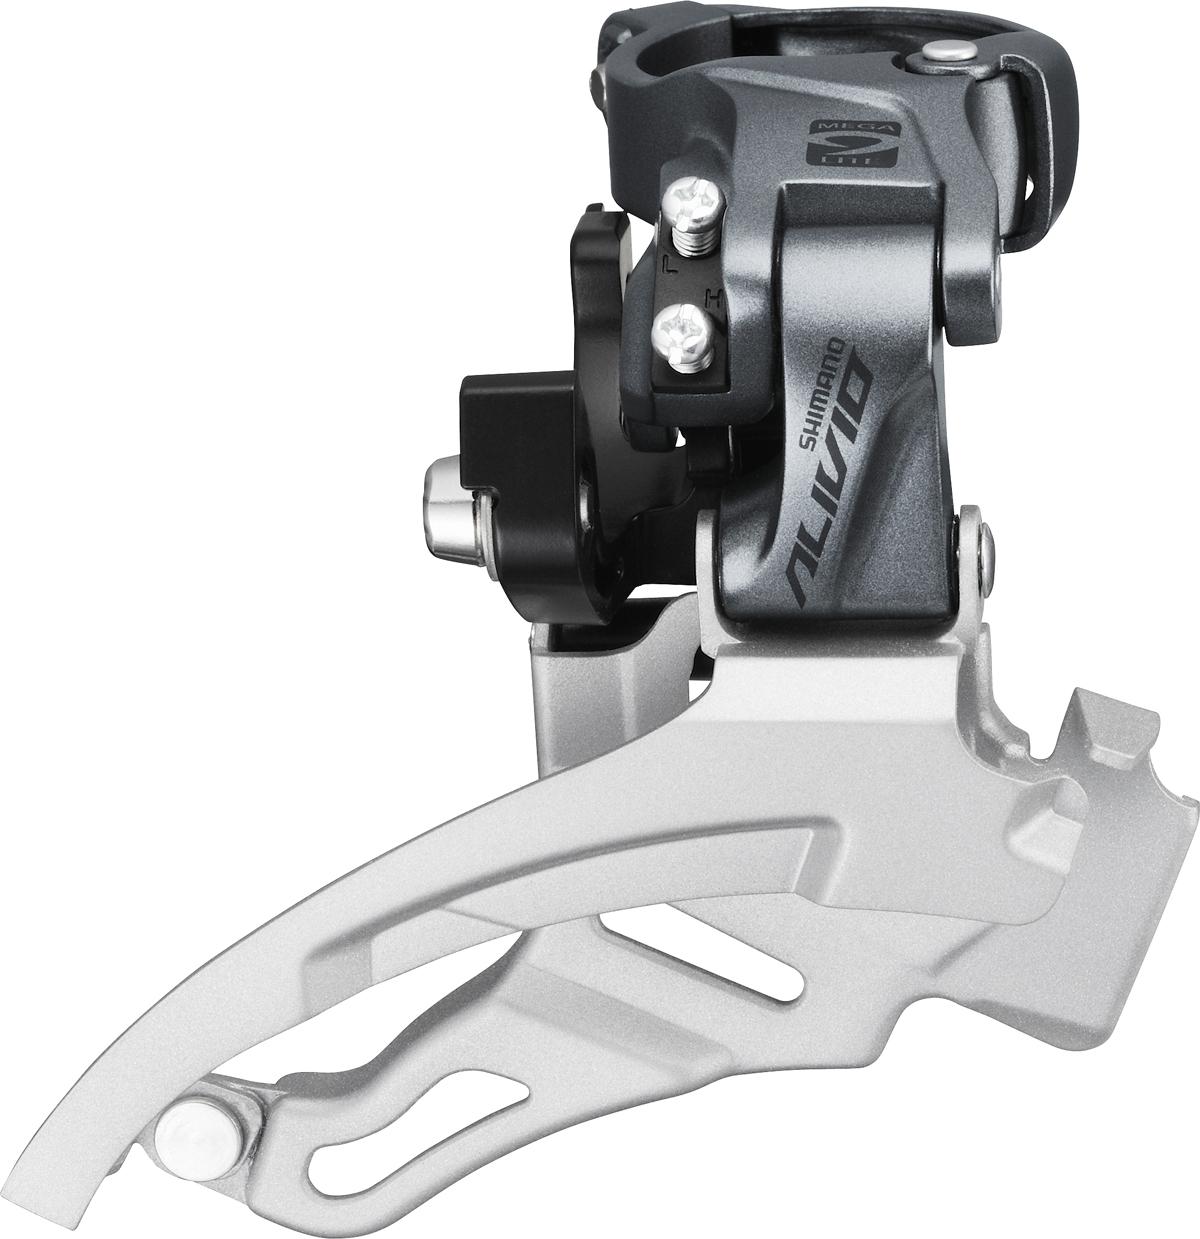 Shimano přesmykač ALIVIO FD-M4000 MTB pro 3x9 obj. 34,9/31,8 + 28,6 Down-swing dual pull 40 z